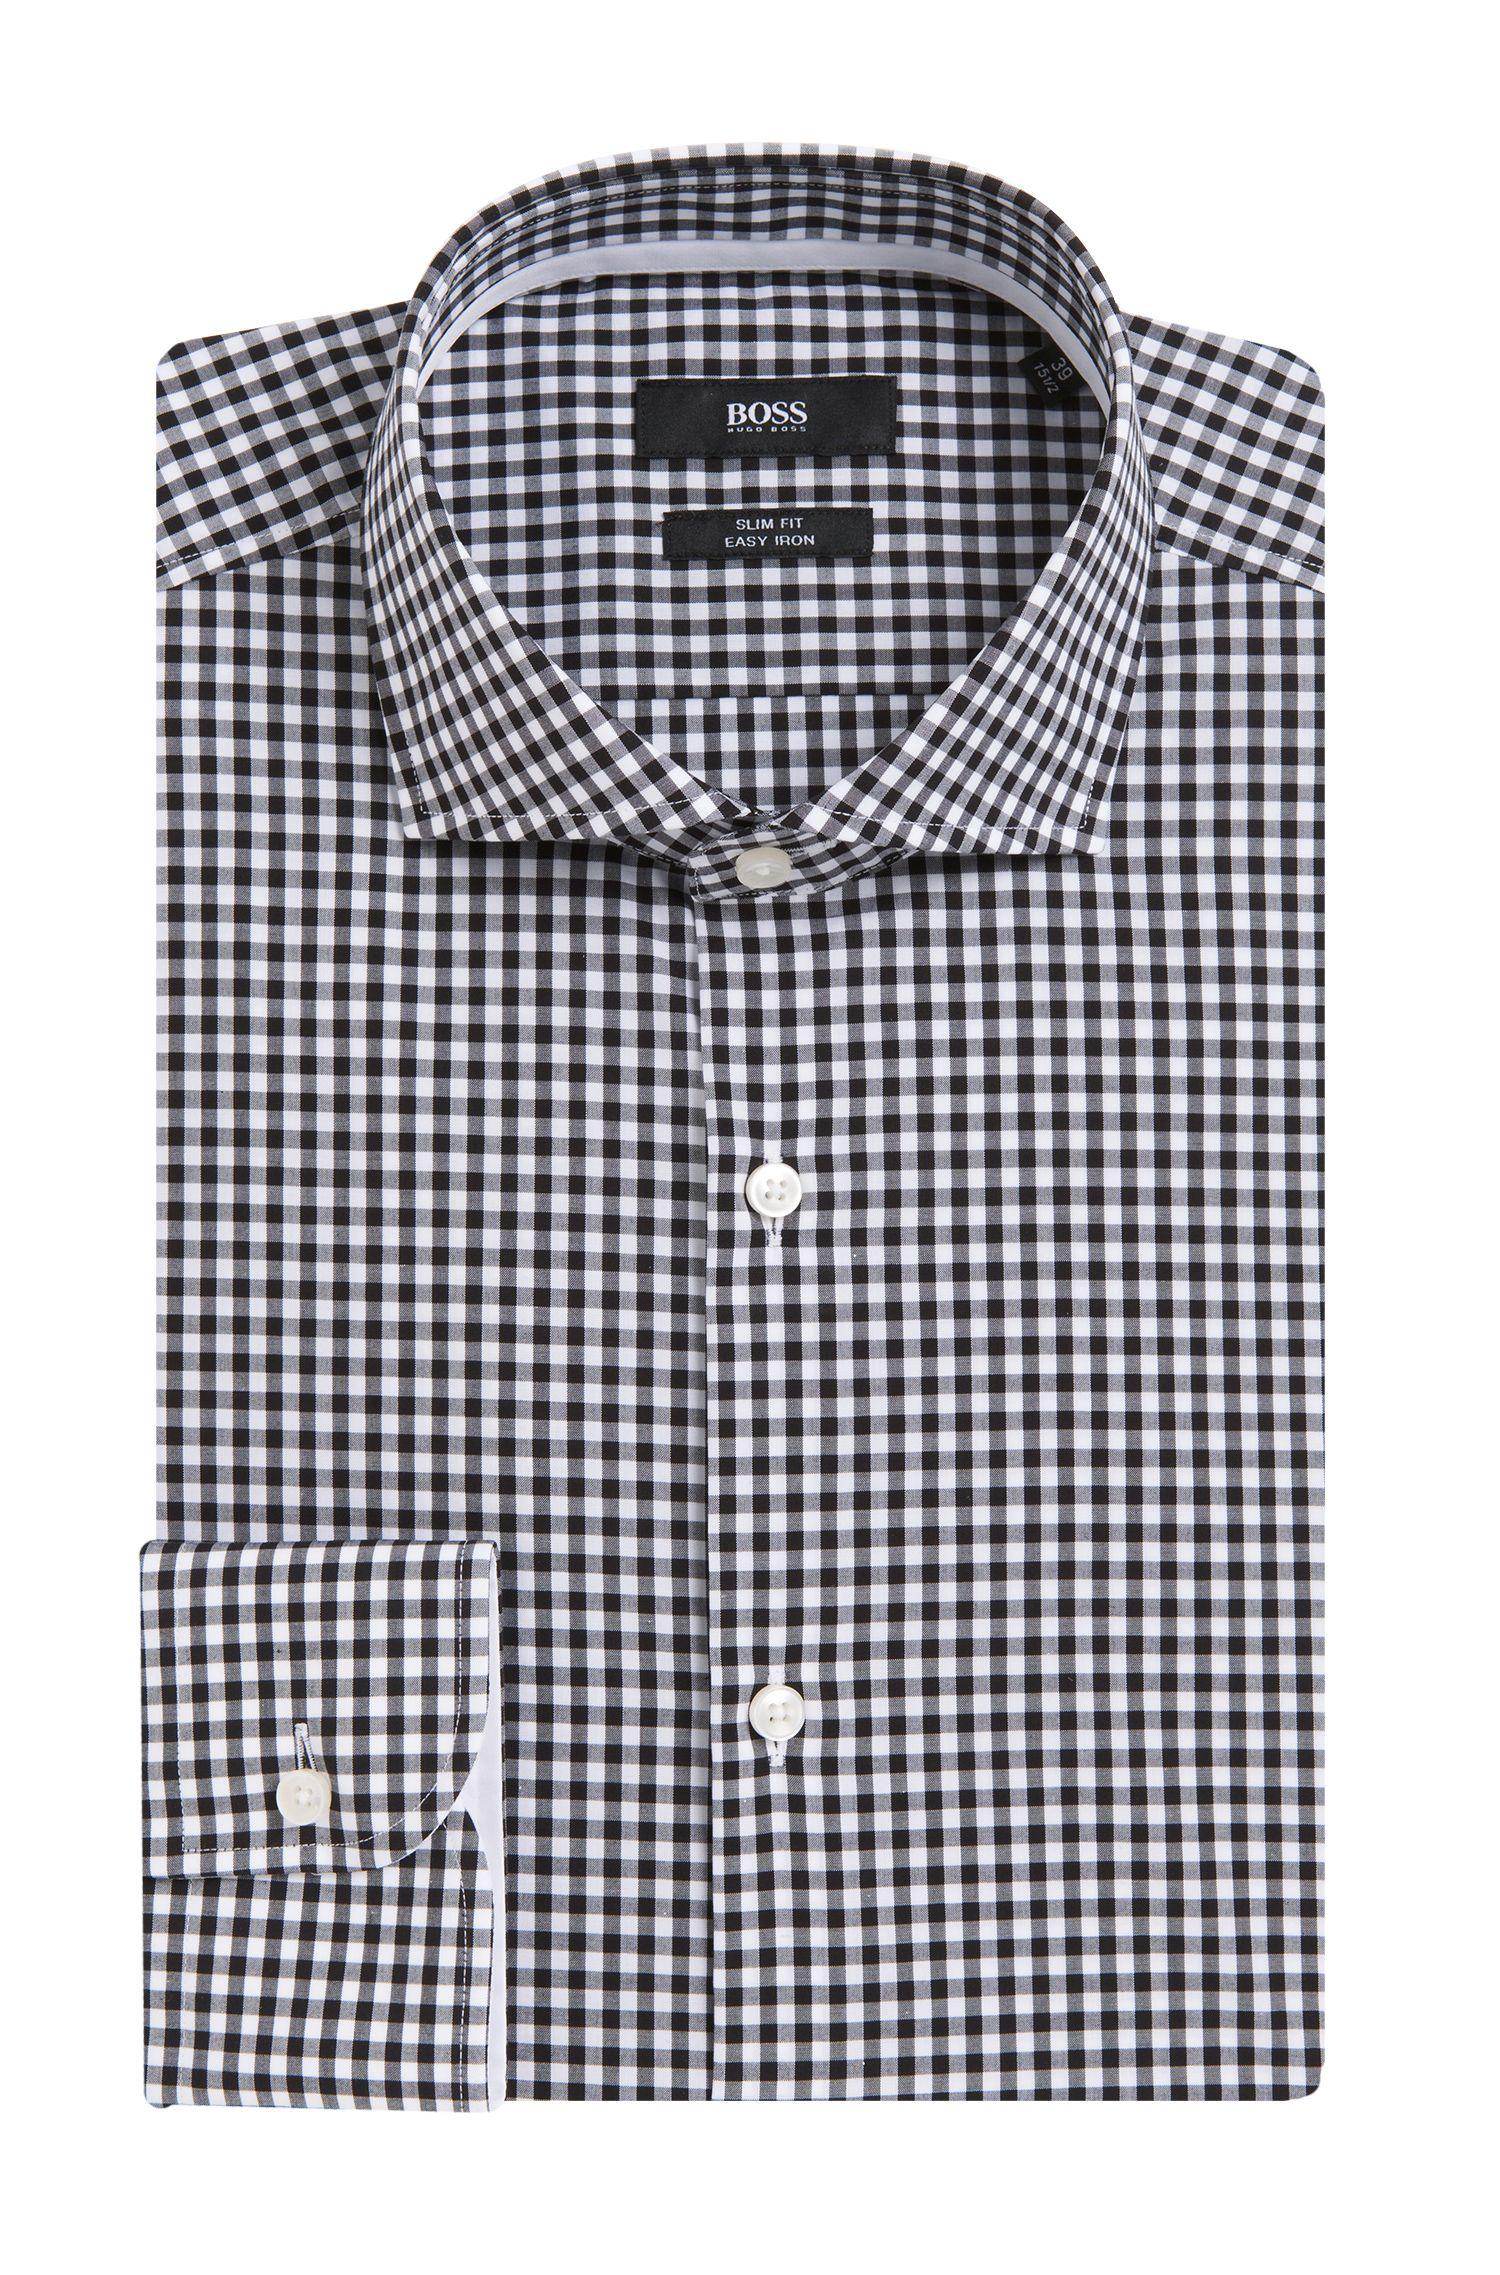 'Jery' | Slim Fit, Easy Iron Cotton Dress Shirt